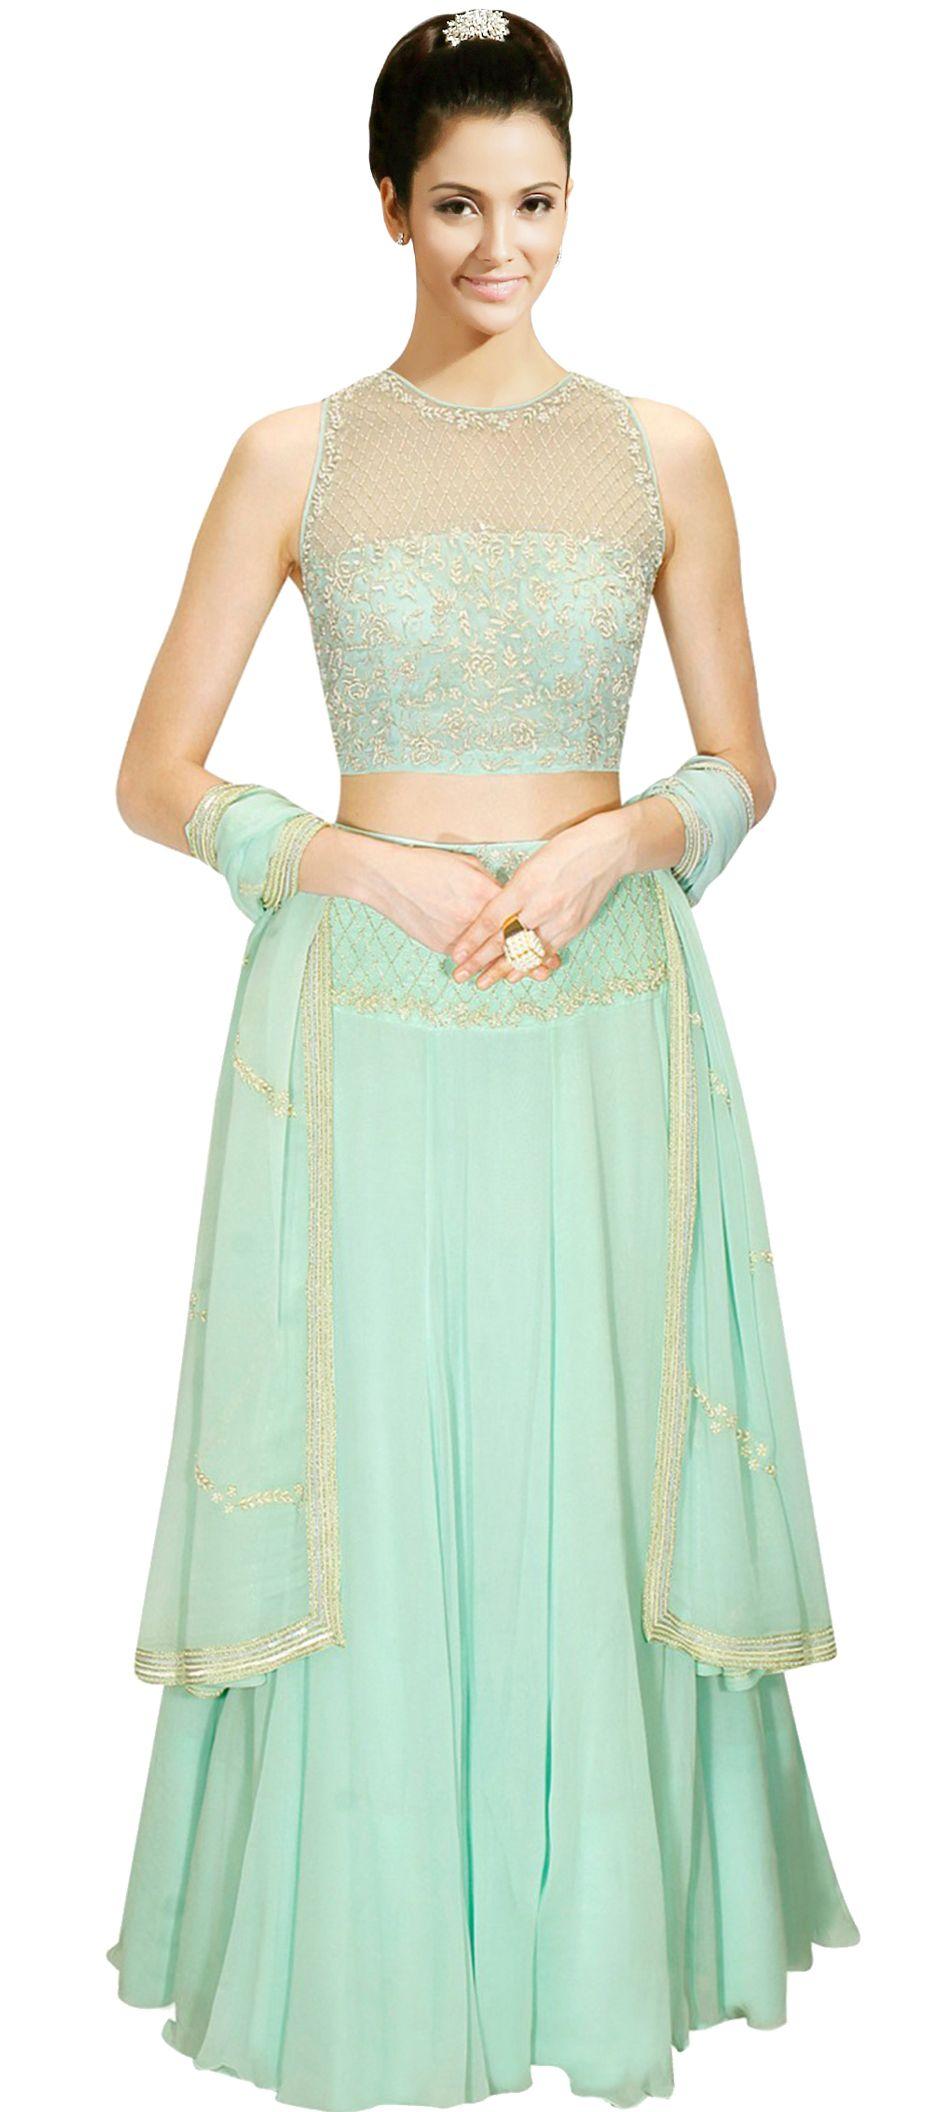 183908: Green color family Brides maid Lehenga, Mehendi & Sangeet ...